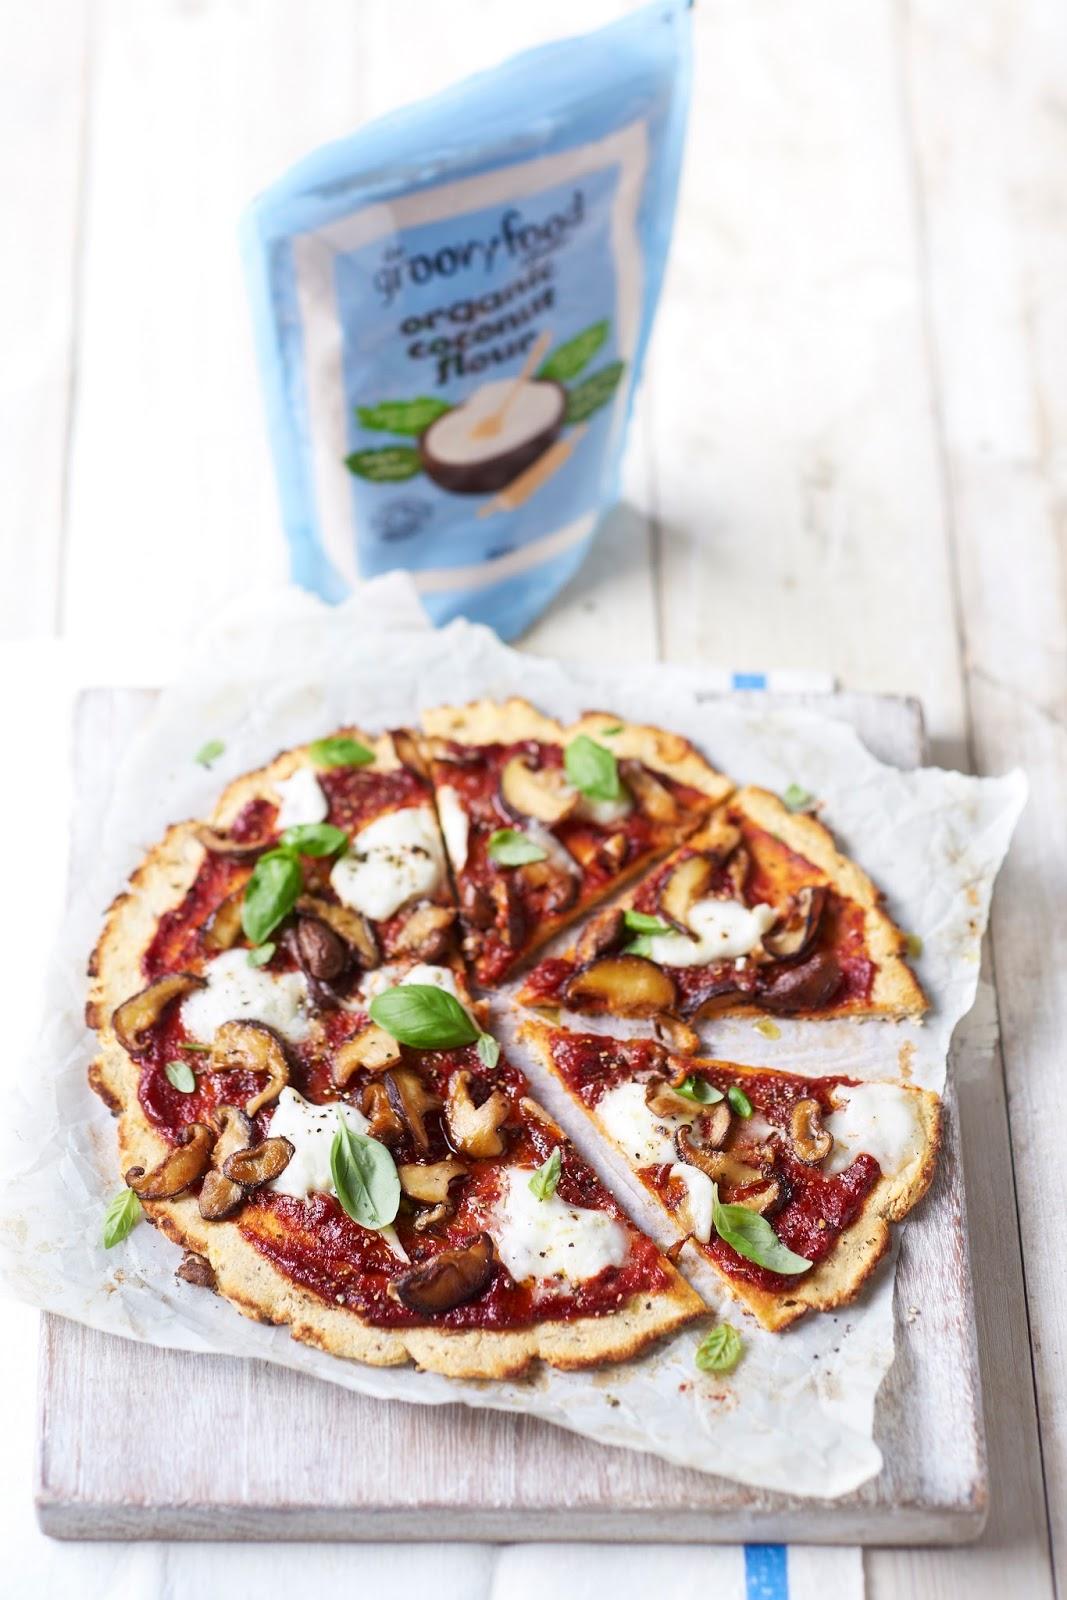 How To Make Lisa Roukin's Grain Free Plantain Pizza